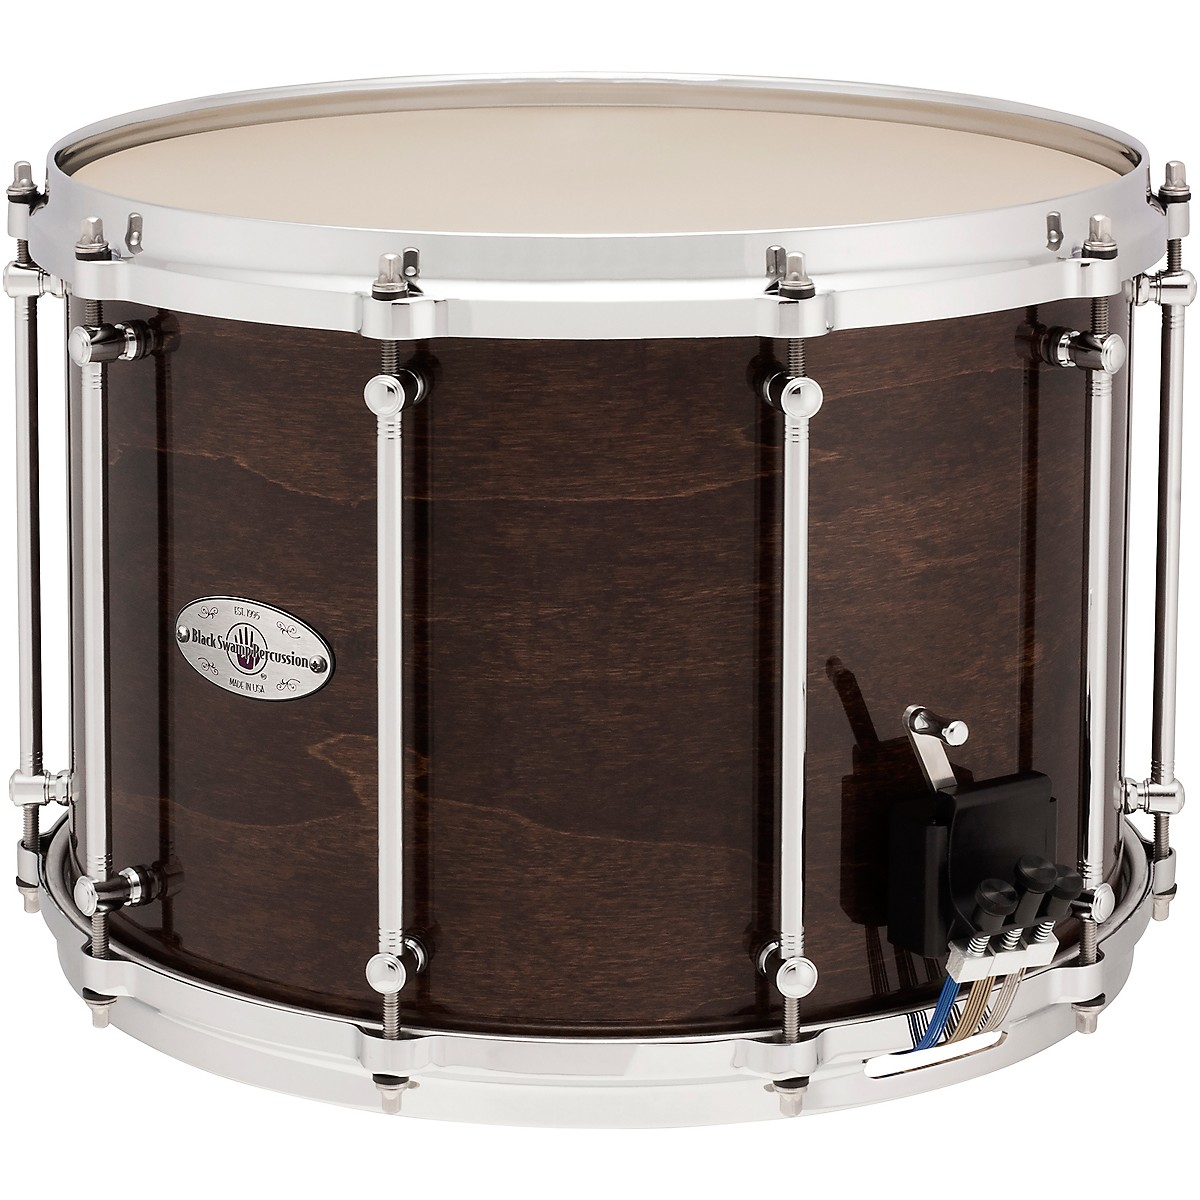 Black Swamp Percussion Symphonic Field Drum